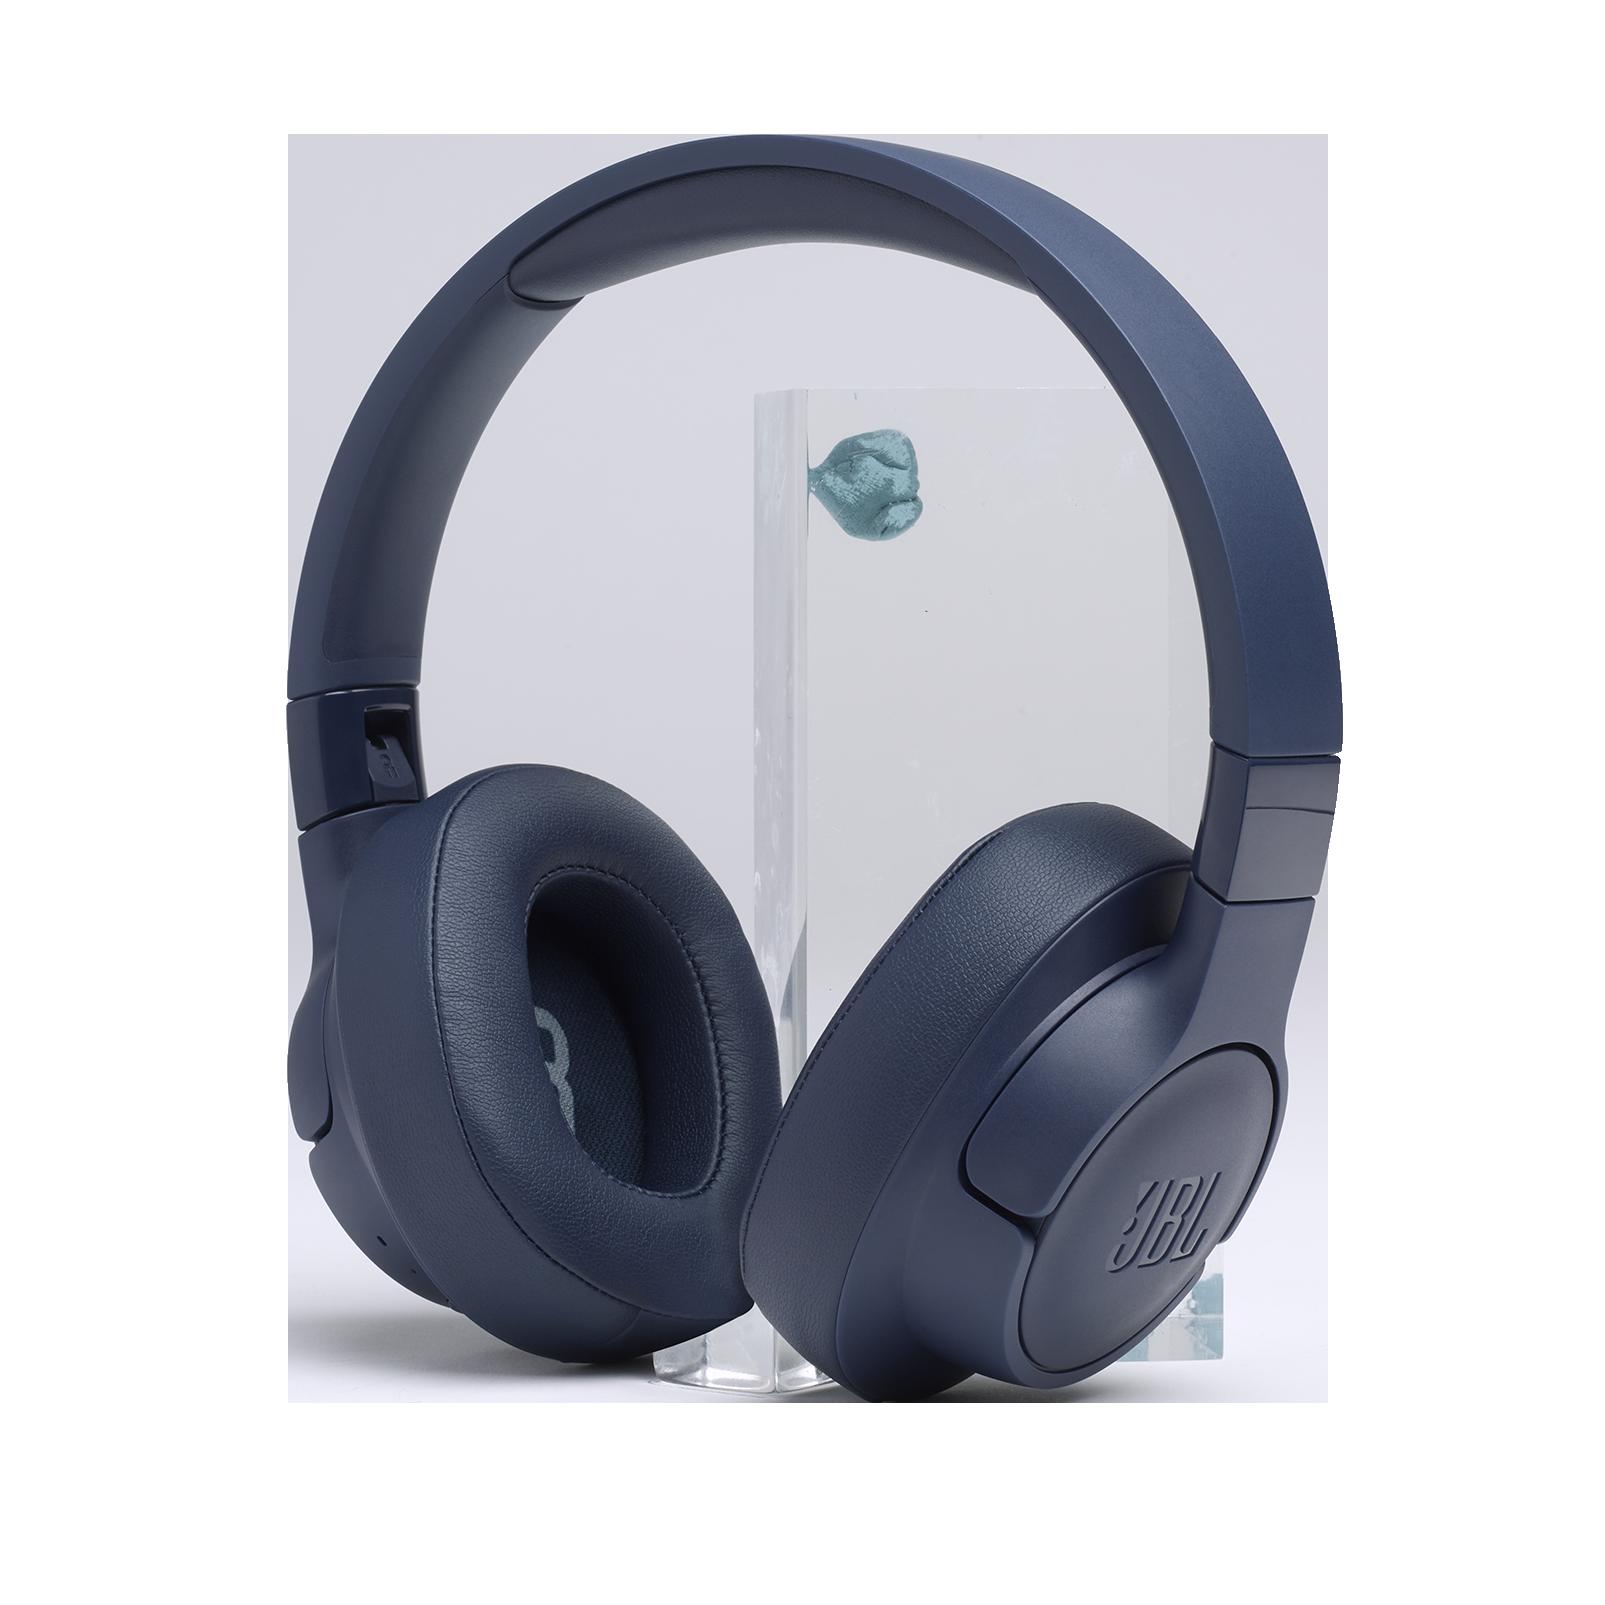 JBL TUNE 700BT - Blue - Wireless Over-Ear Headphones - Detailshot 6